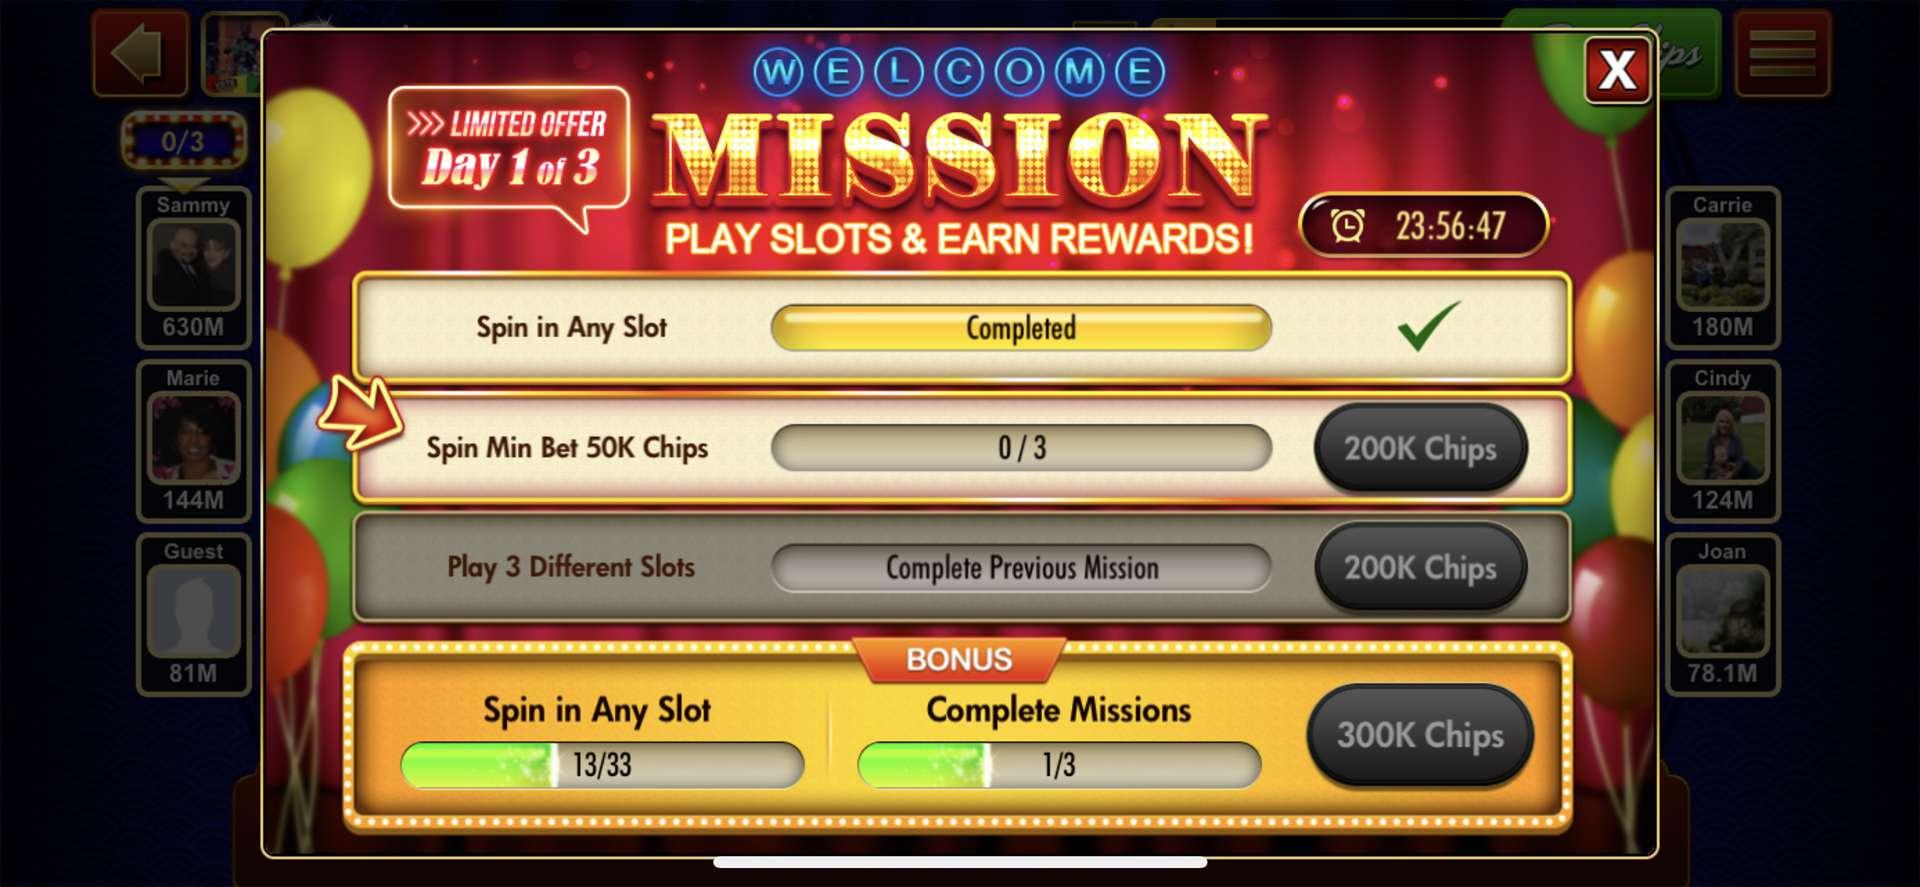 Online casino reviews 2014